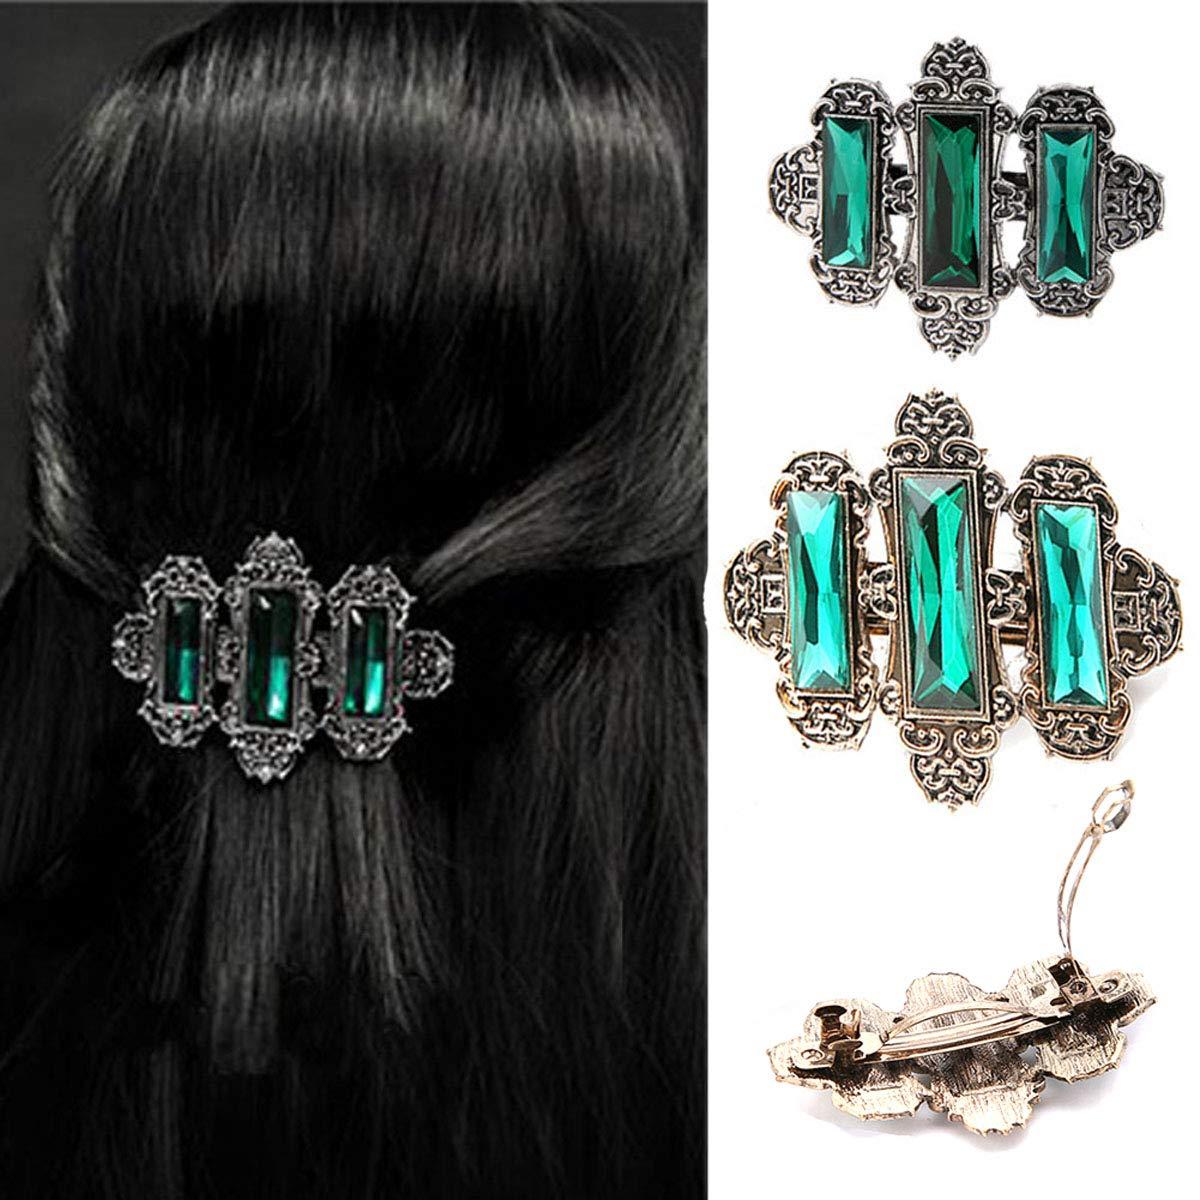 2PCS Women Lady Handmade Natural Crystal Hair Barrettes Metal Hair Pins French Styles Hair Barrettes Hair Clips Hair Accessory (Green)